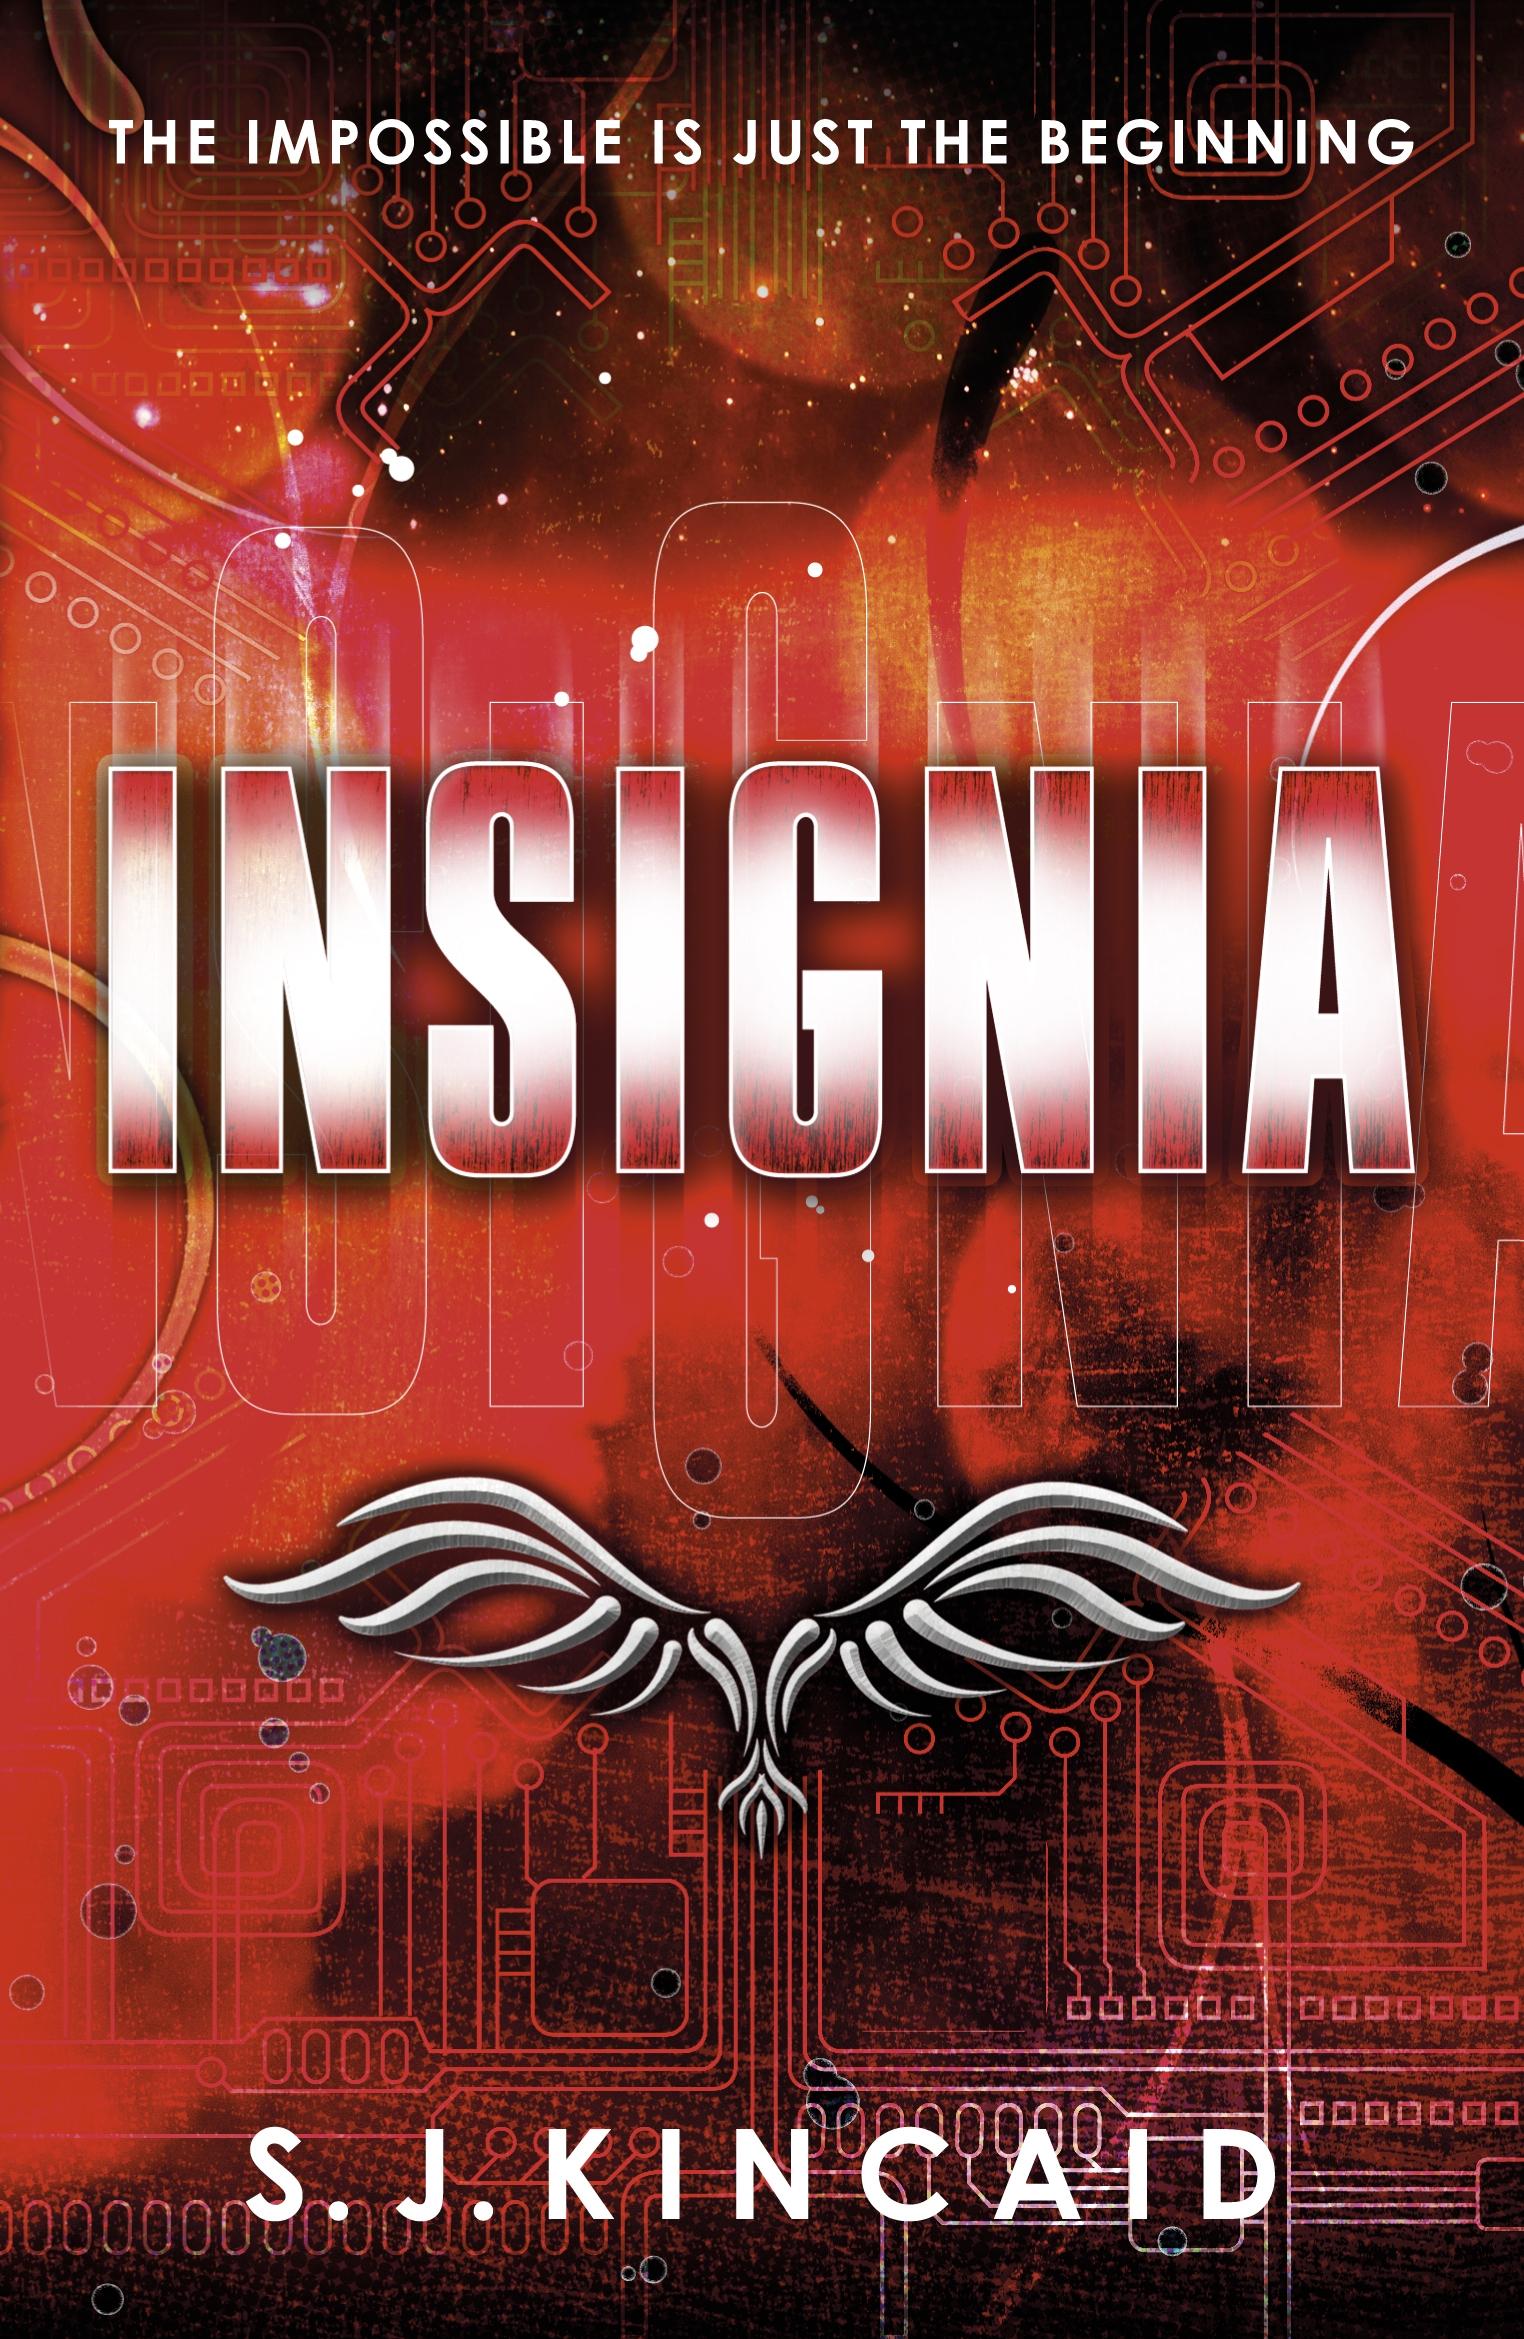 Insignia by S. J. Kincaid